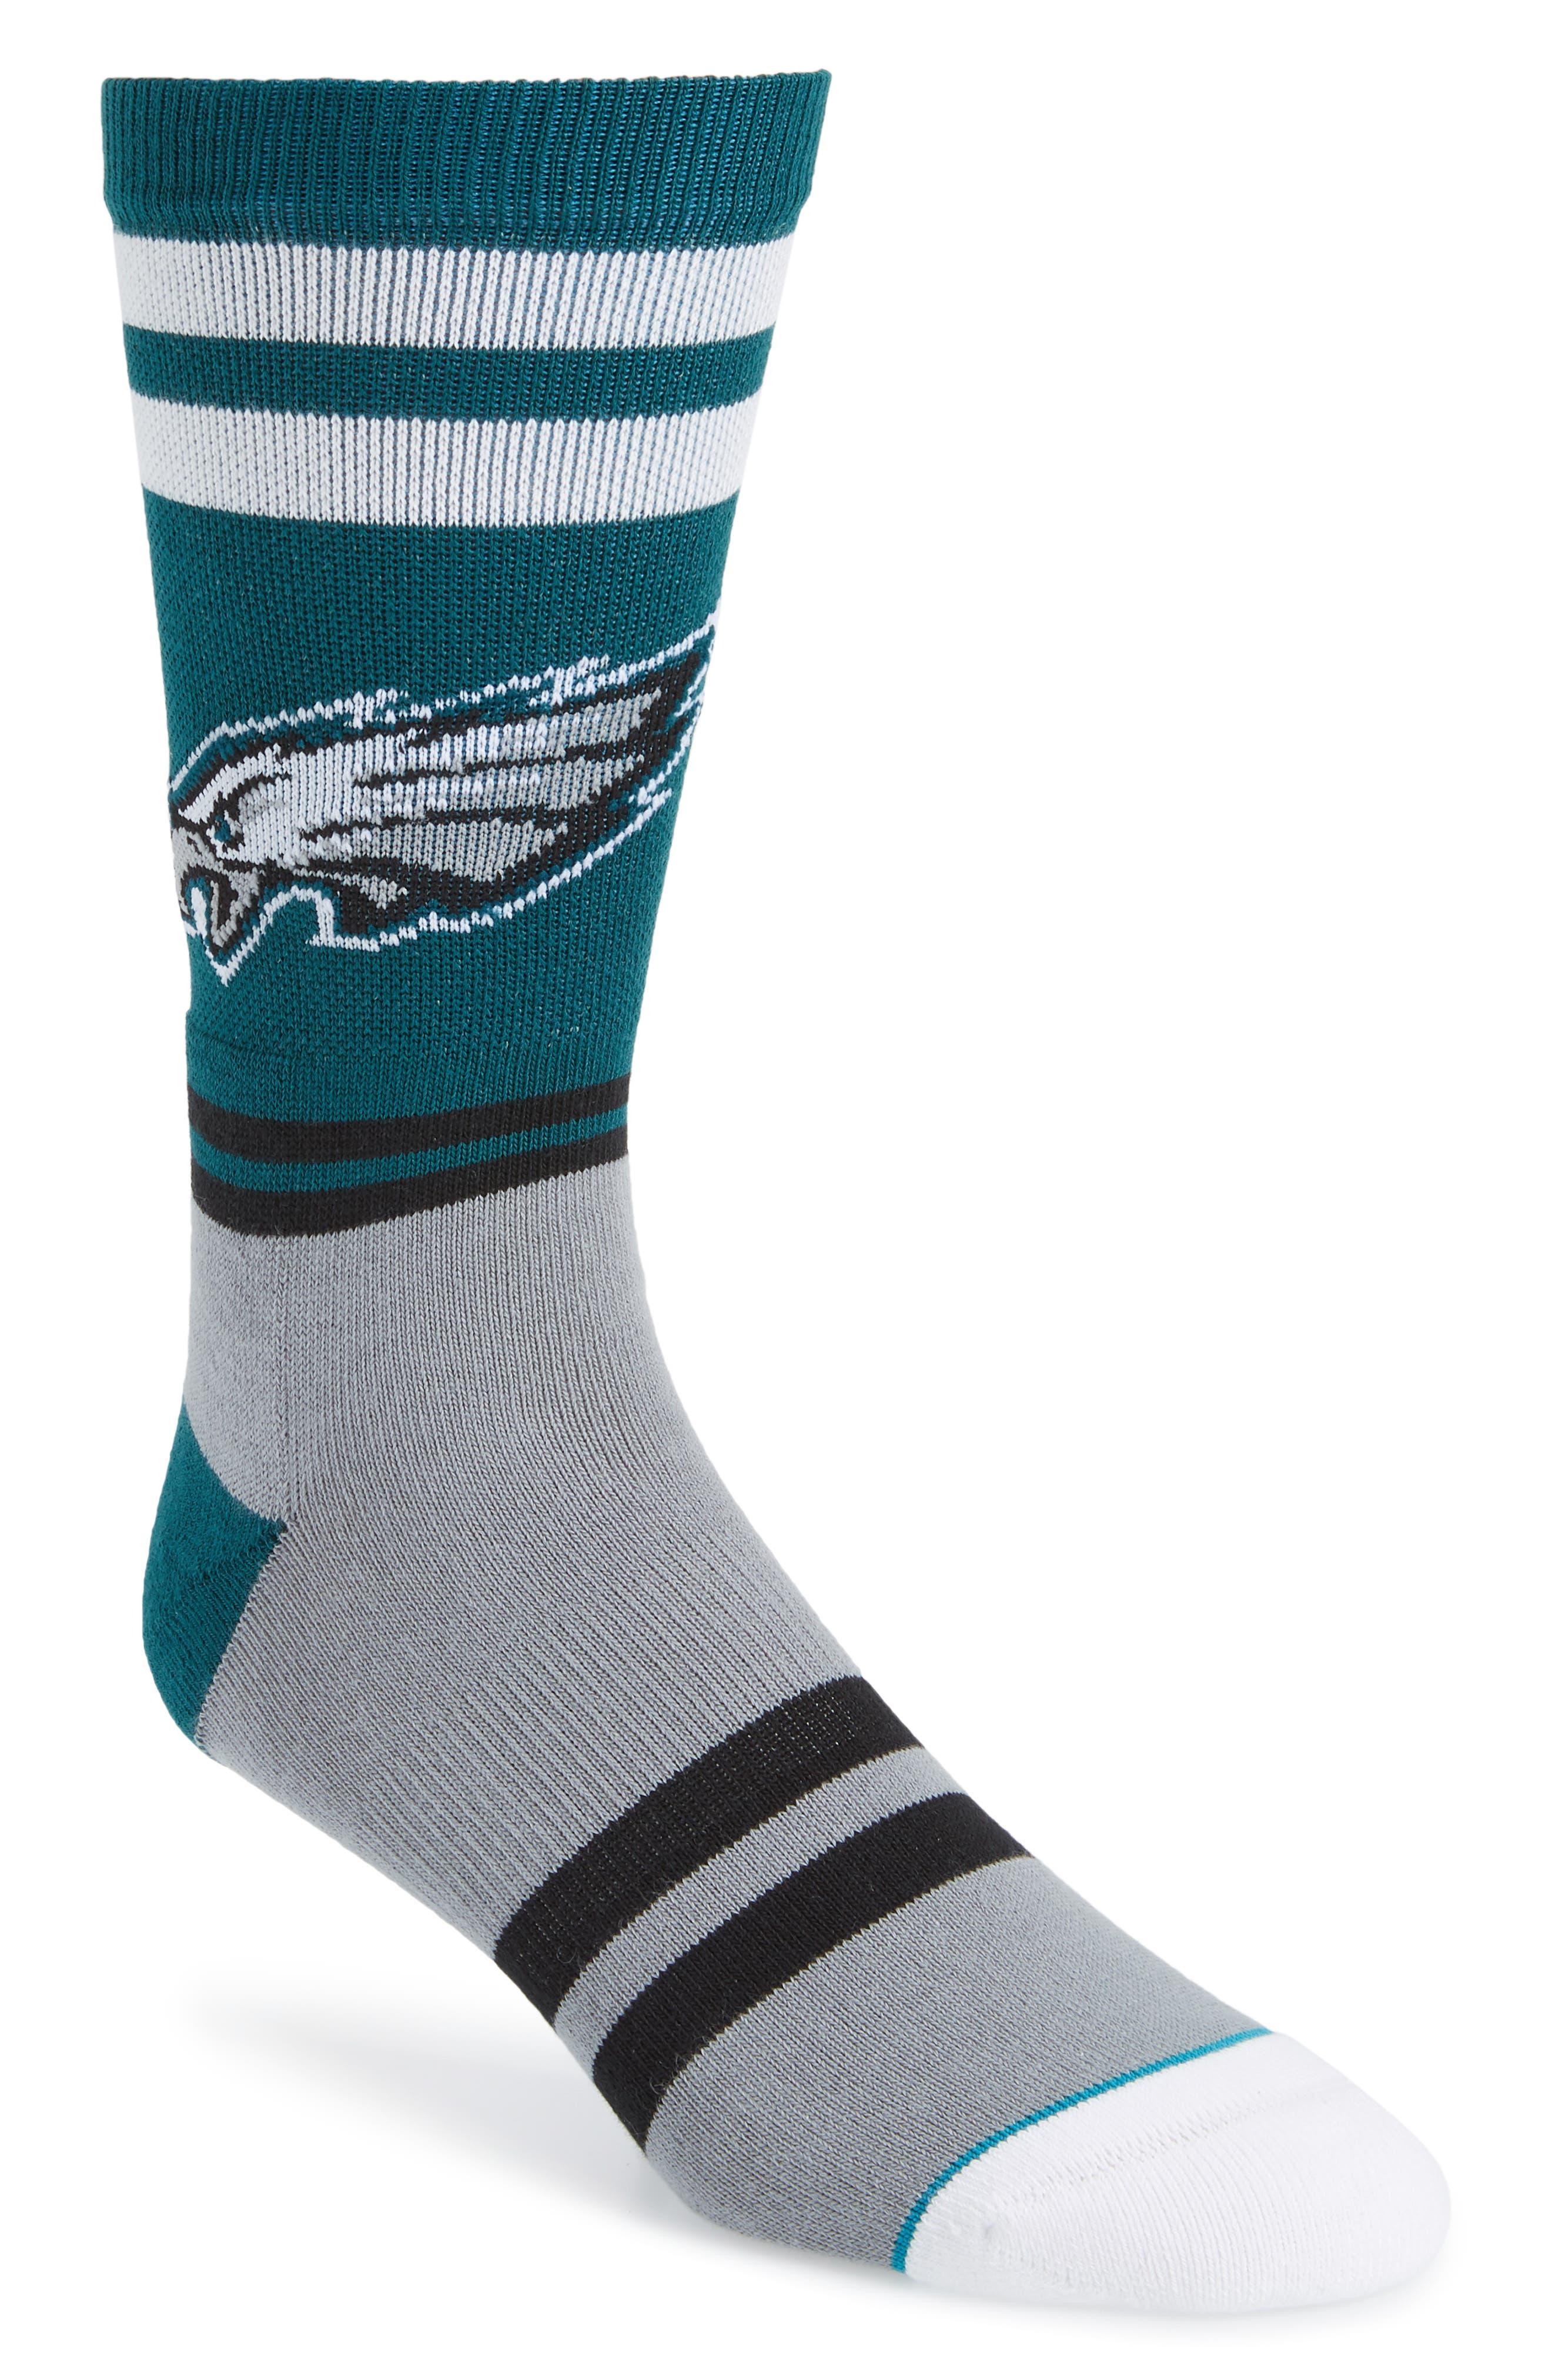 Philadelphia Eagles Socks,                         Main,                         color, GREEN